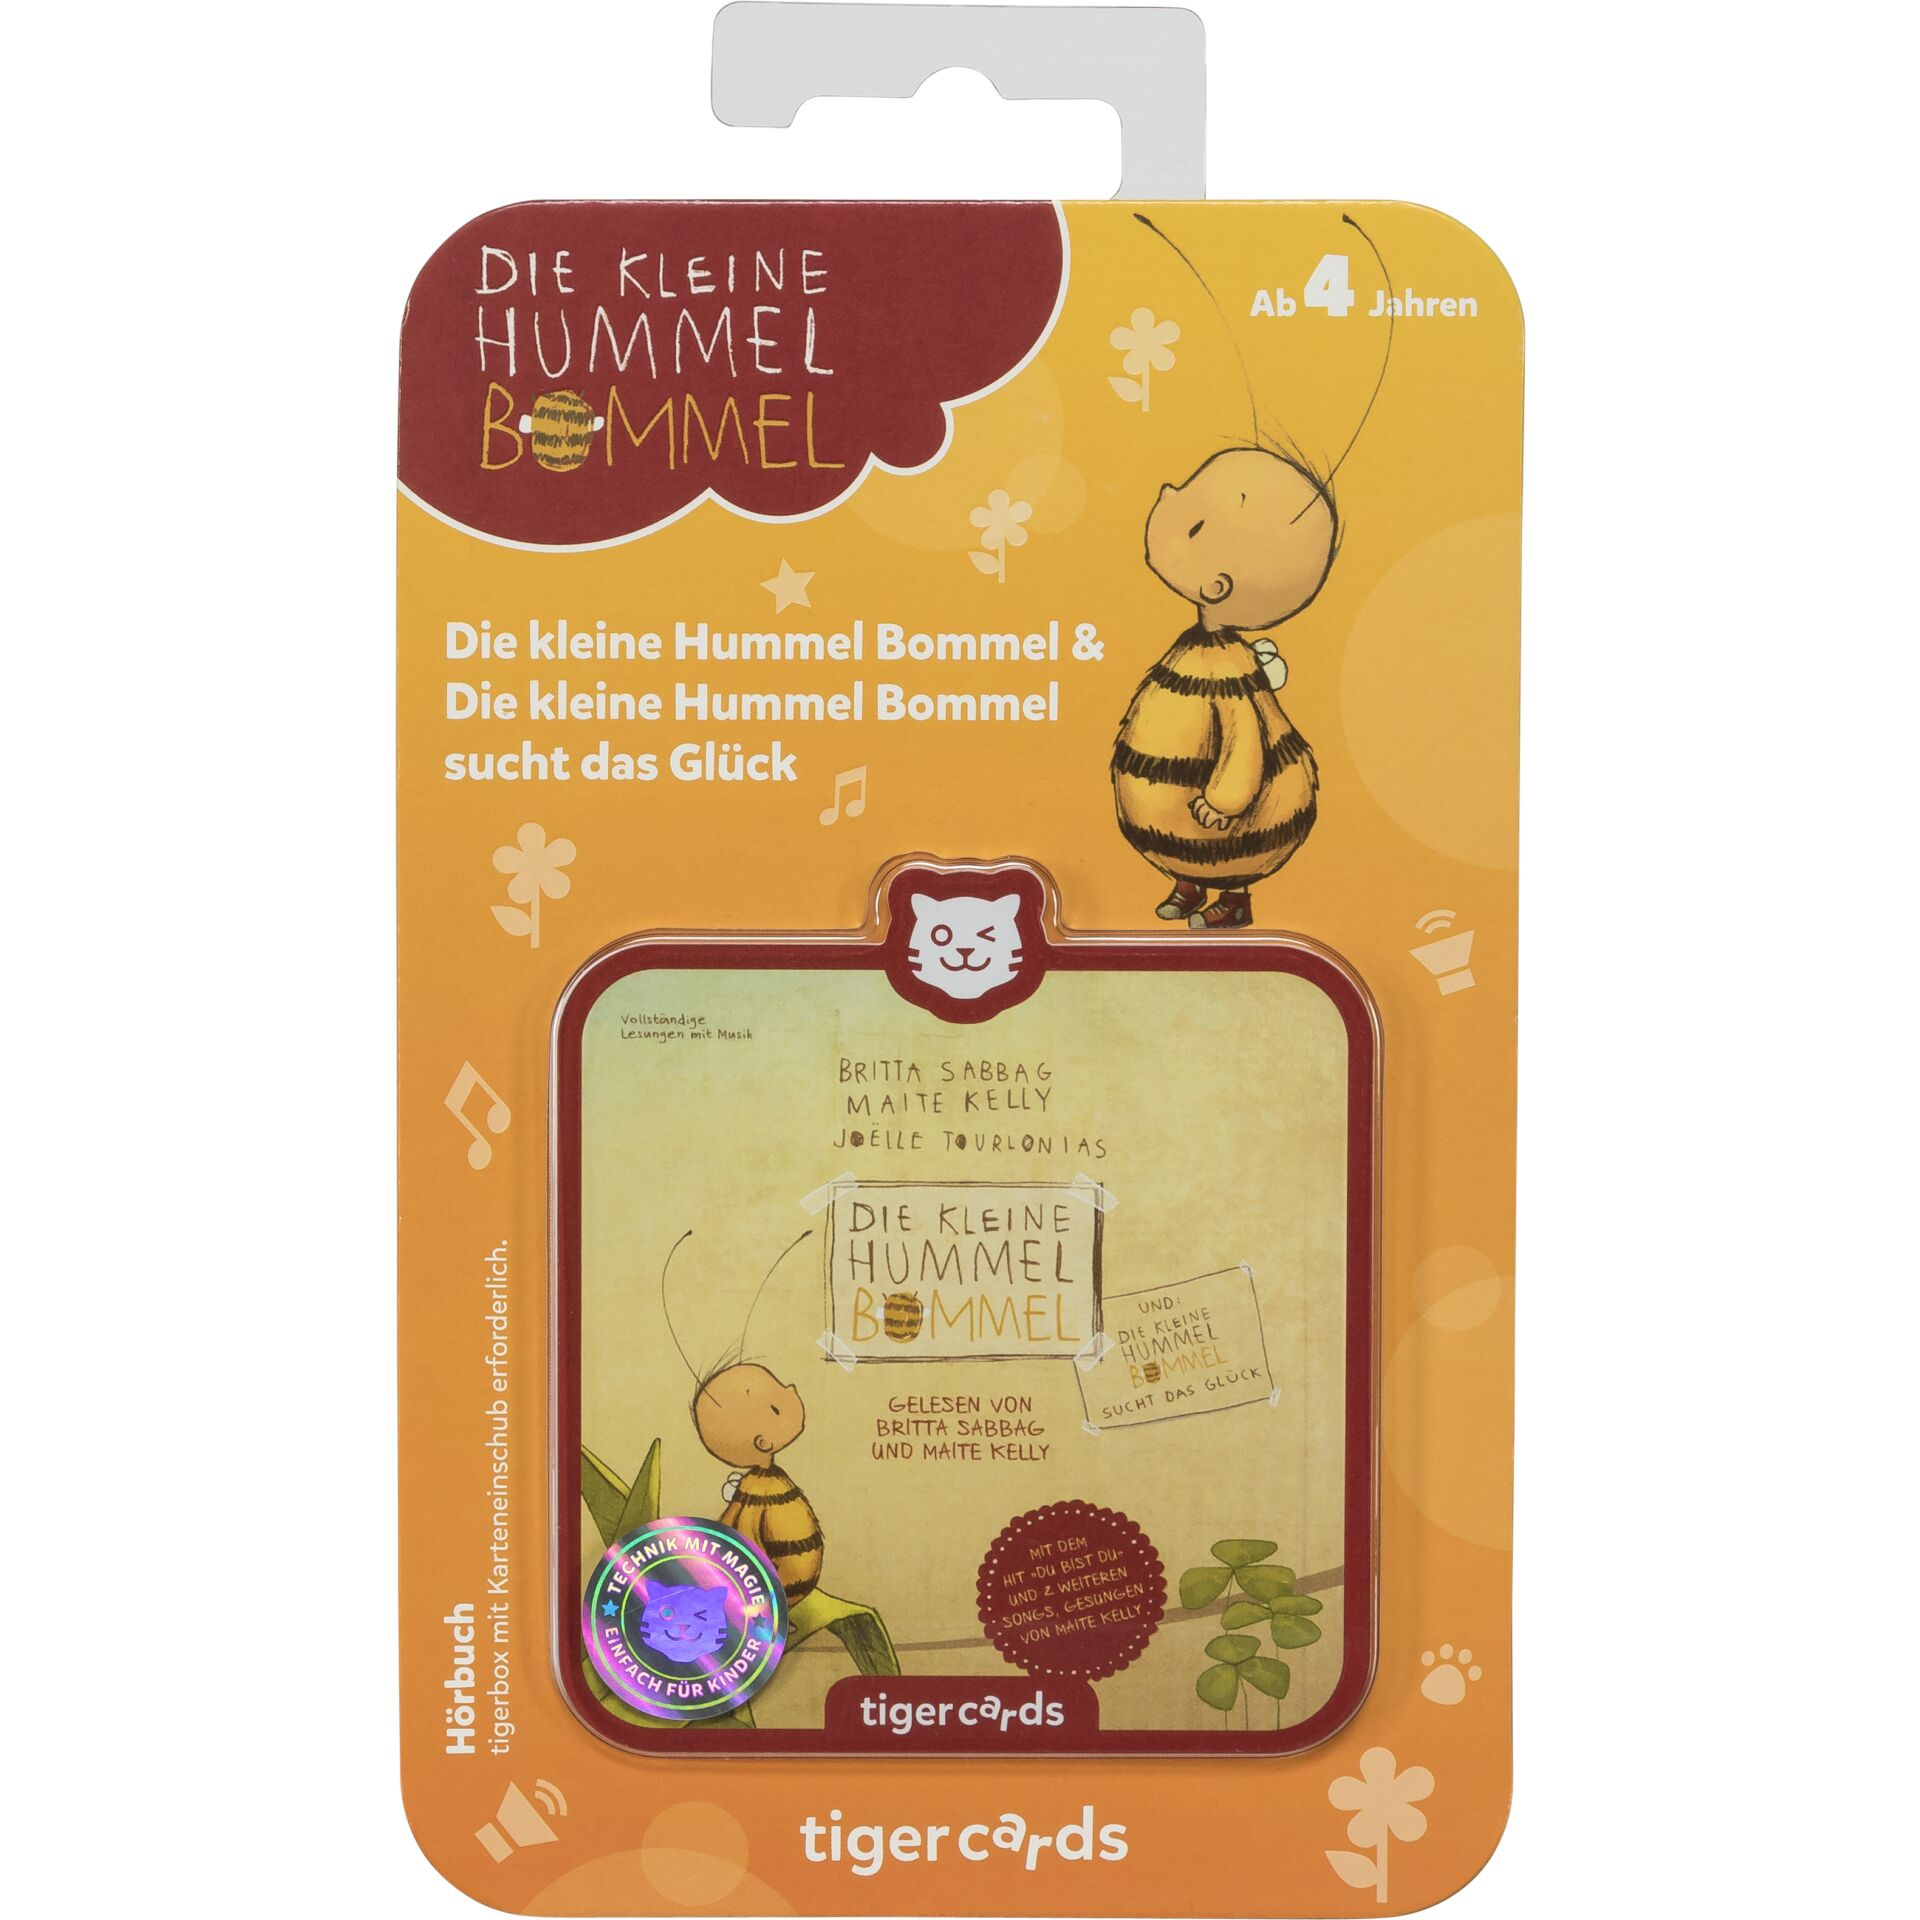 tigermedia tigercard Die kleine Hummel Bommel